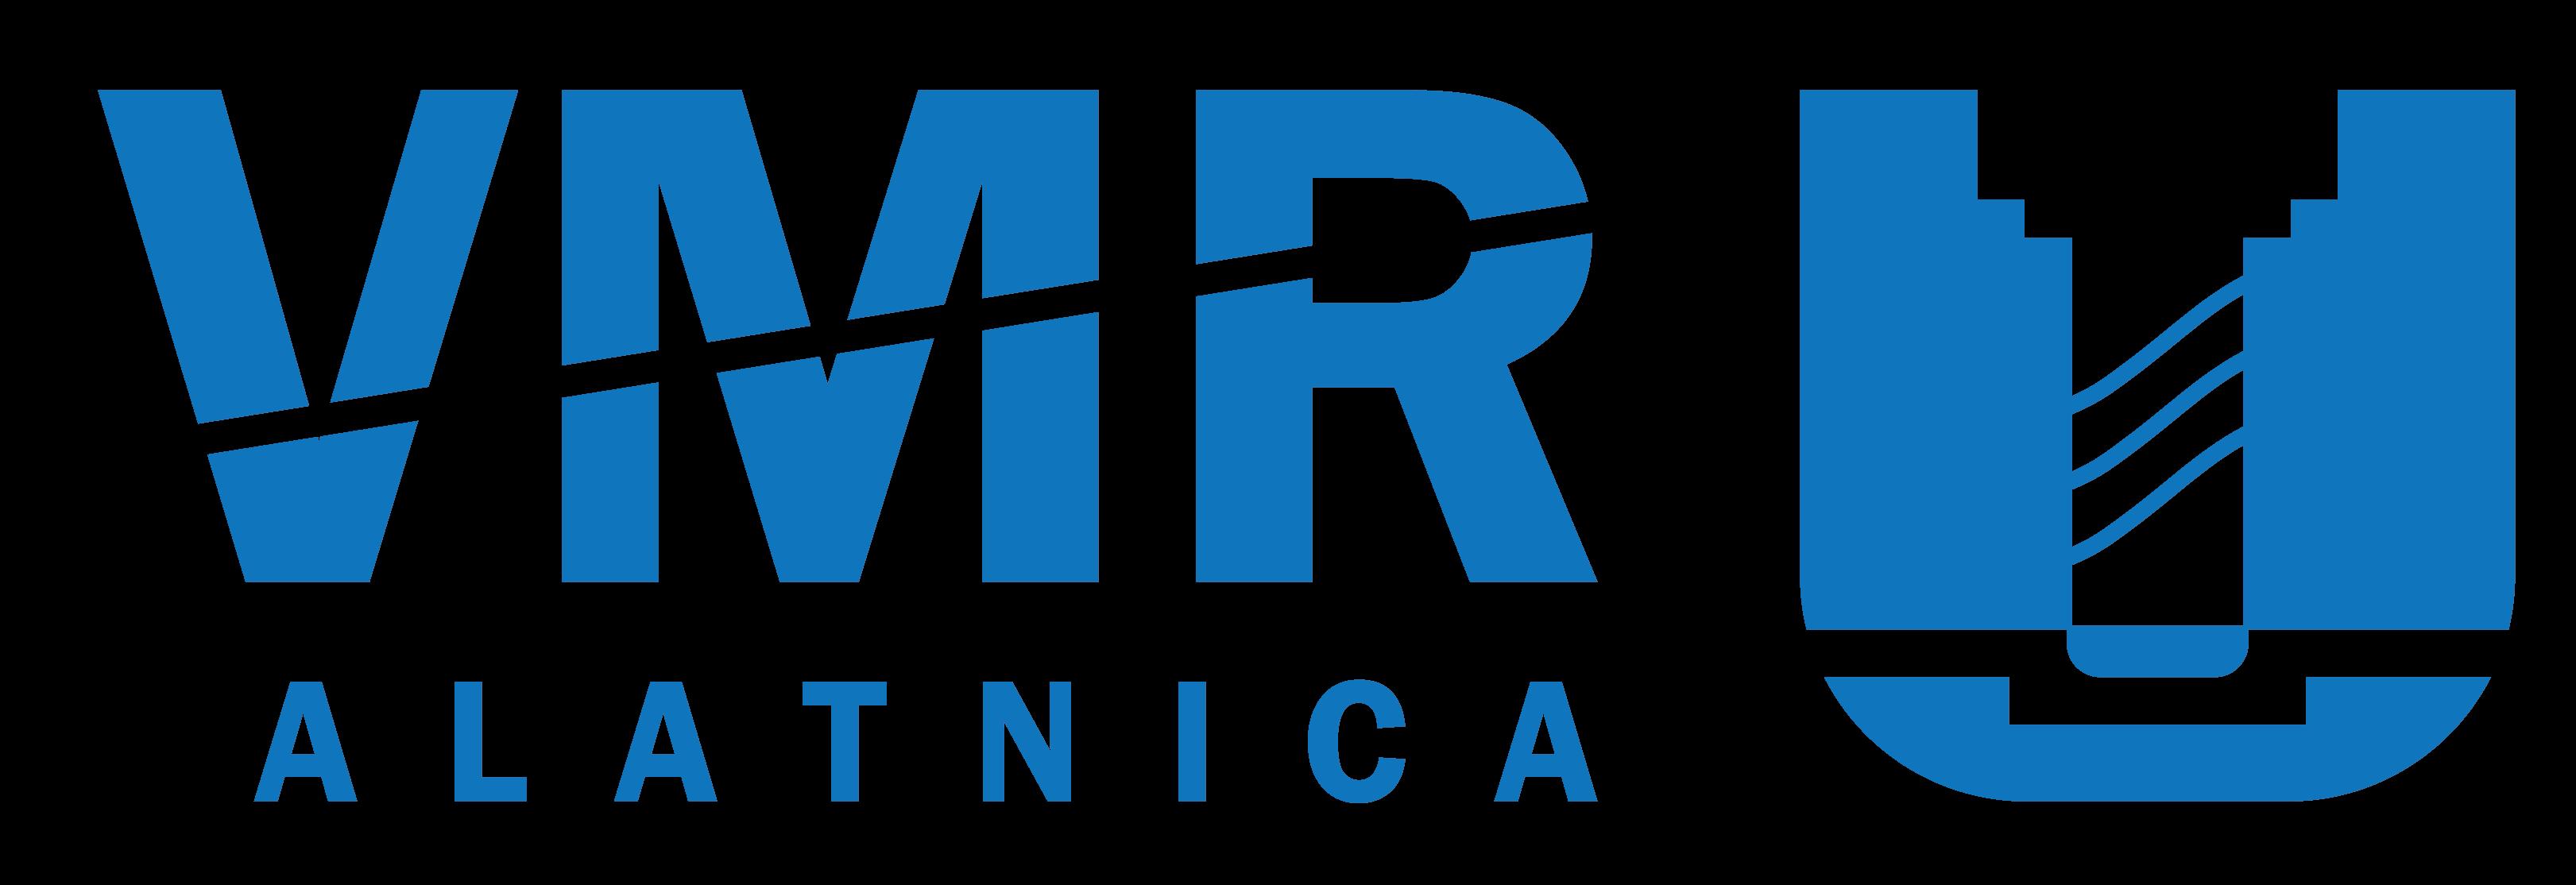 VMR alatnica